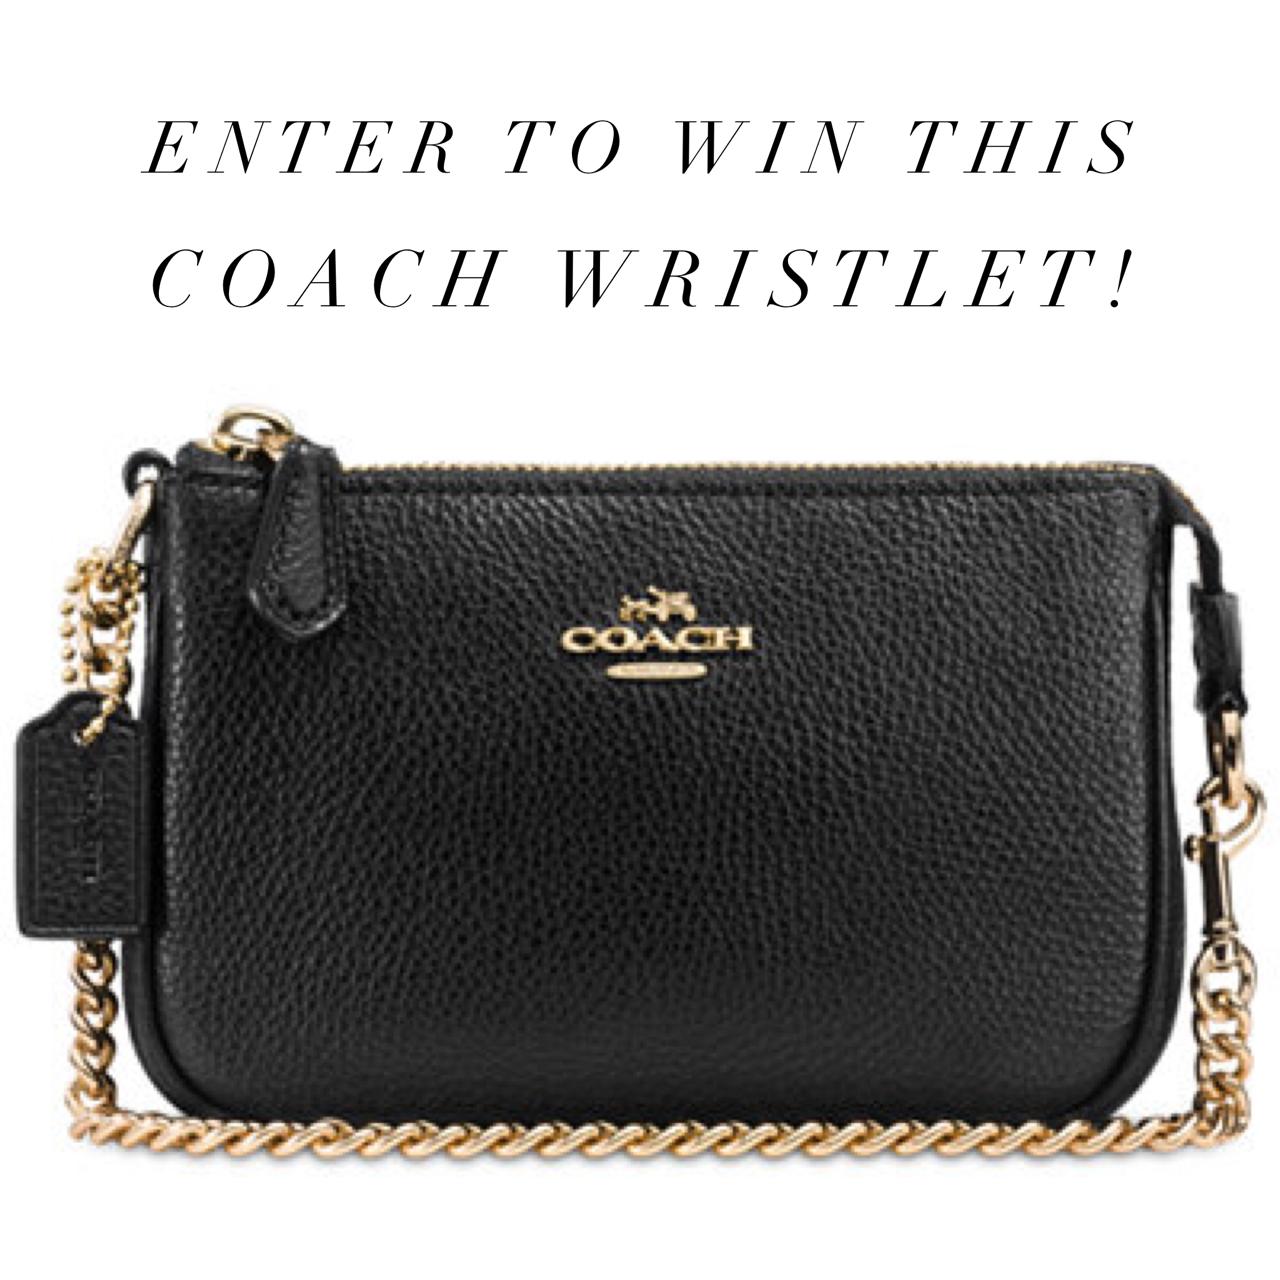 Coach Wristlet Giveaway!!